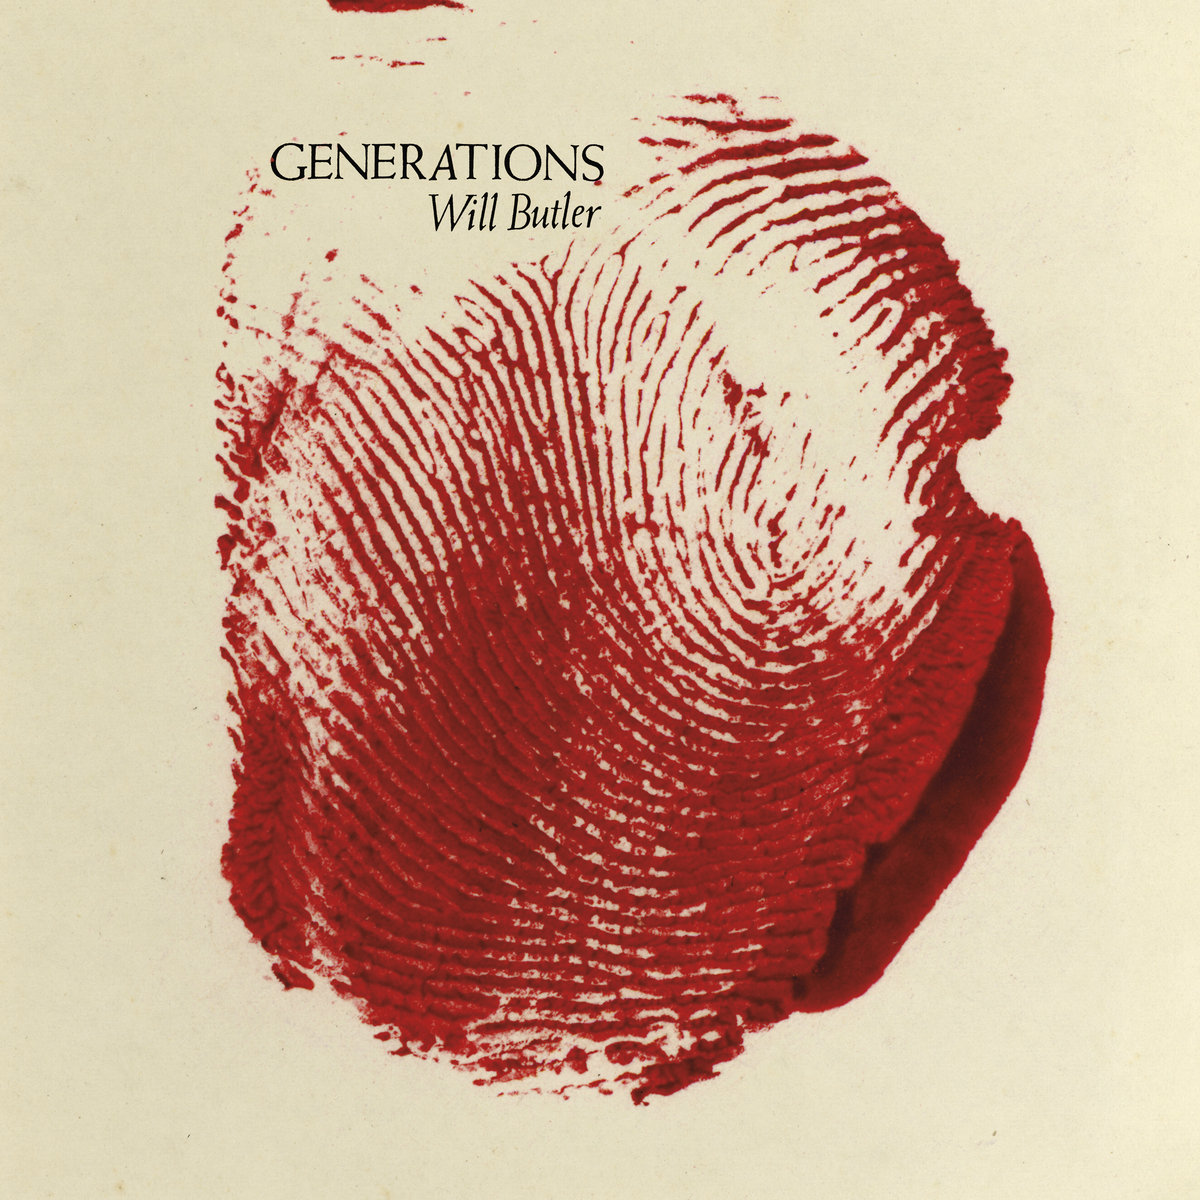 Generations: Un disco donde Will Butler nos invita a reflexionar a través de la crítica